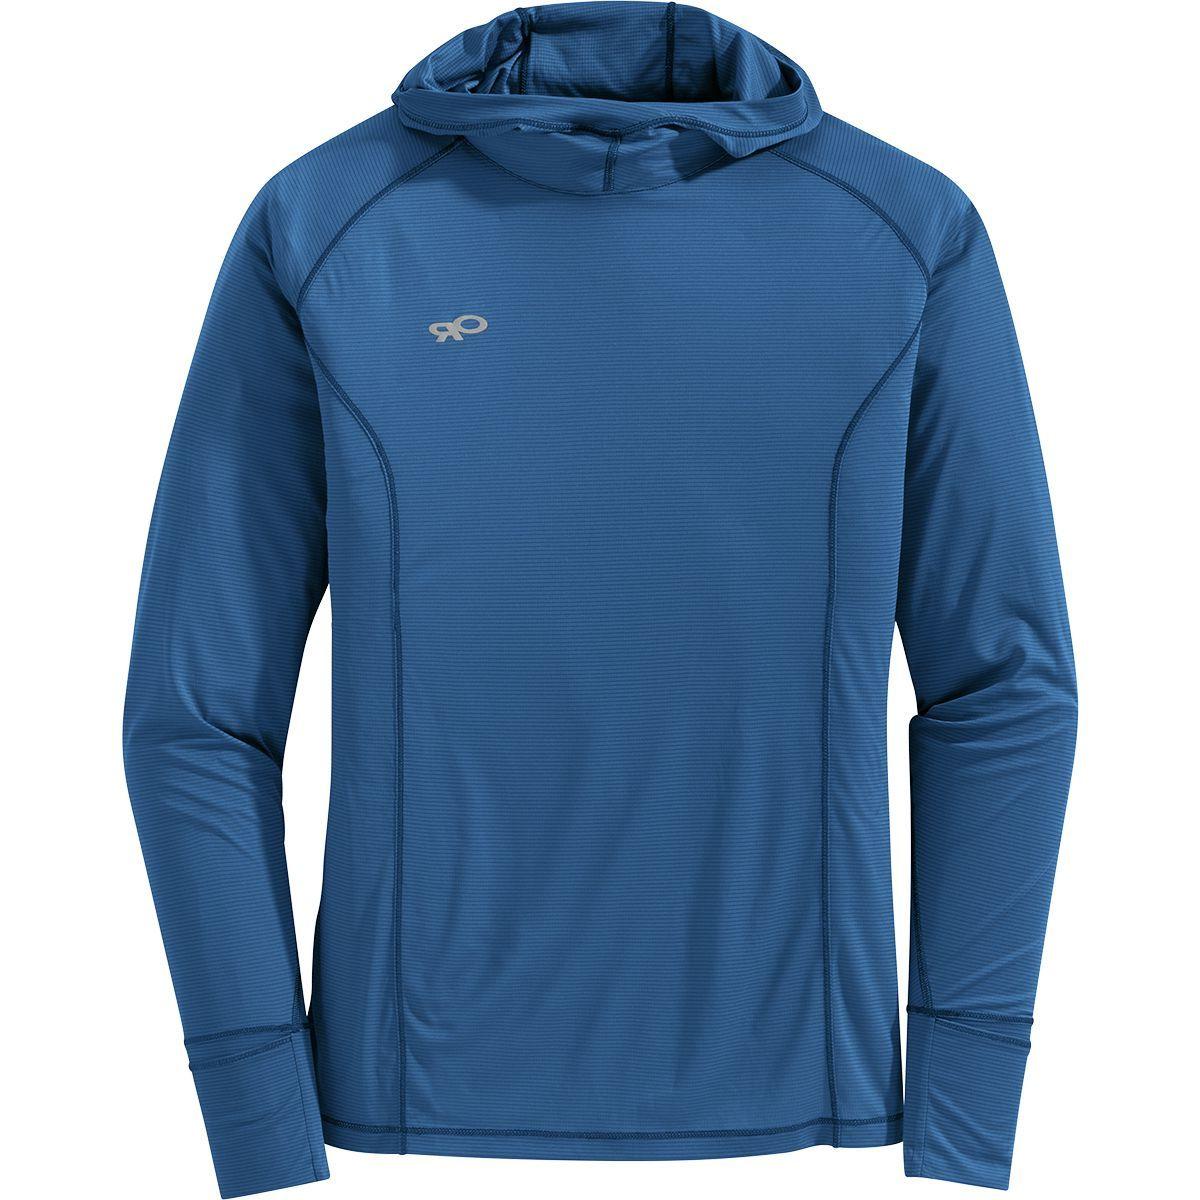 Outdoor Research Echo Hooded Long-Sleeve Shirt - Men's